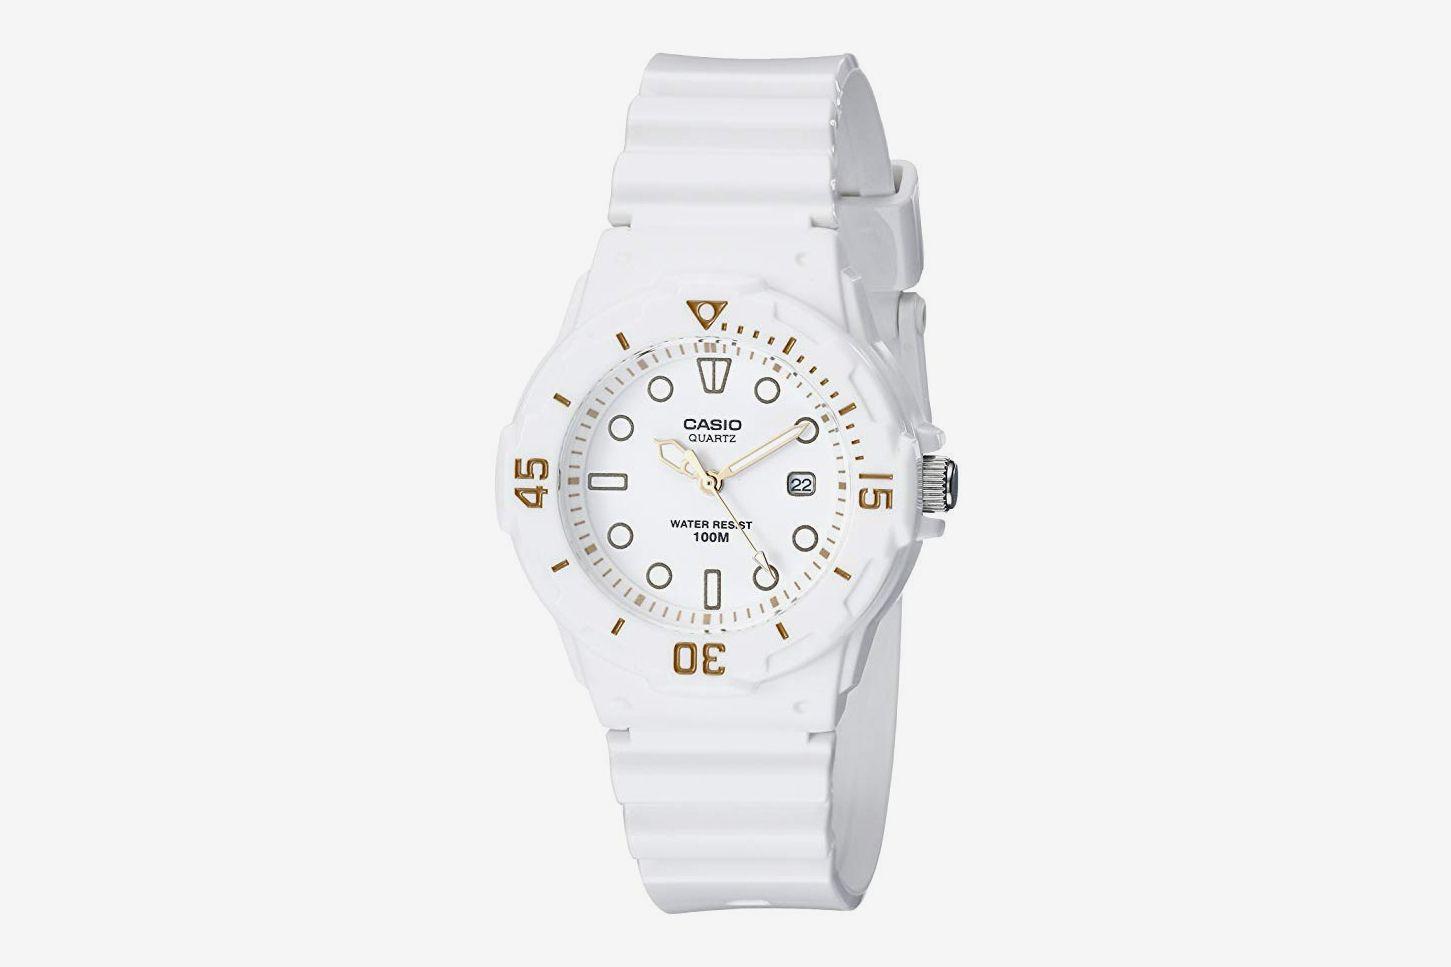 Casio Women's Dive Series Diver-Look White Watch